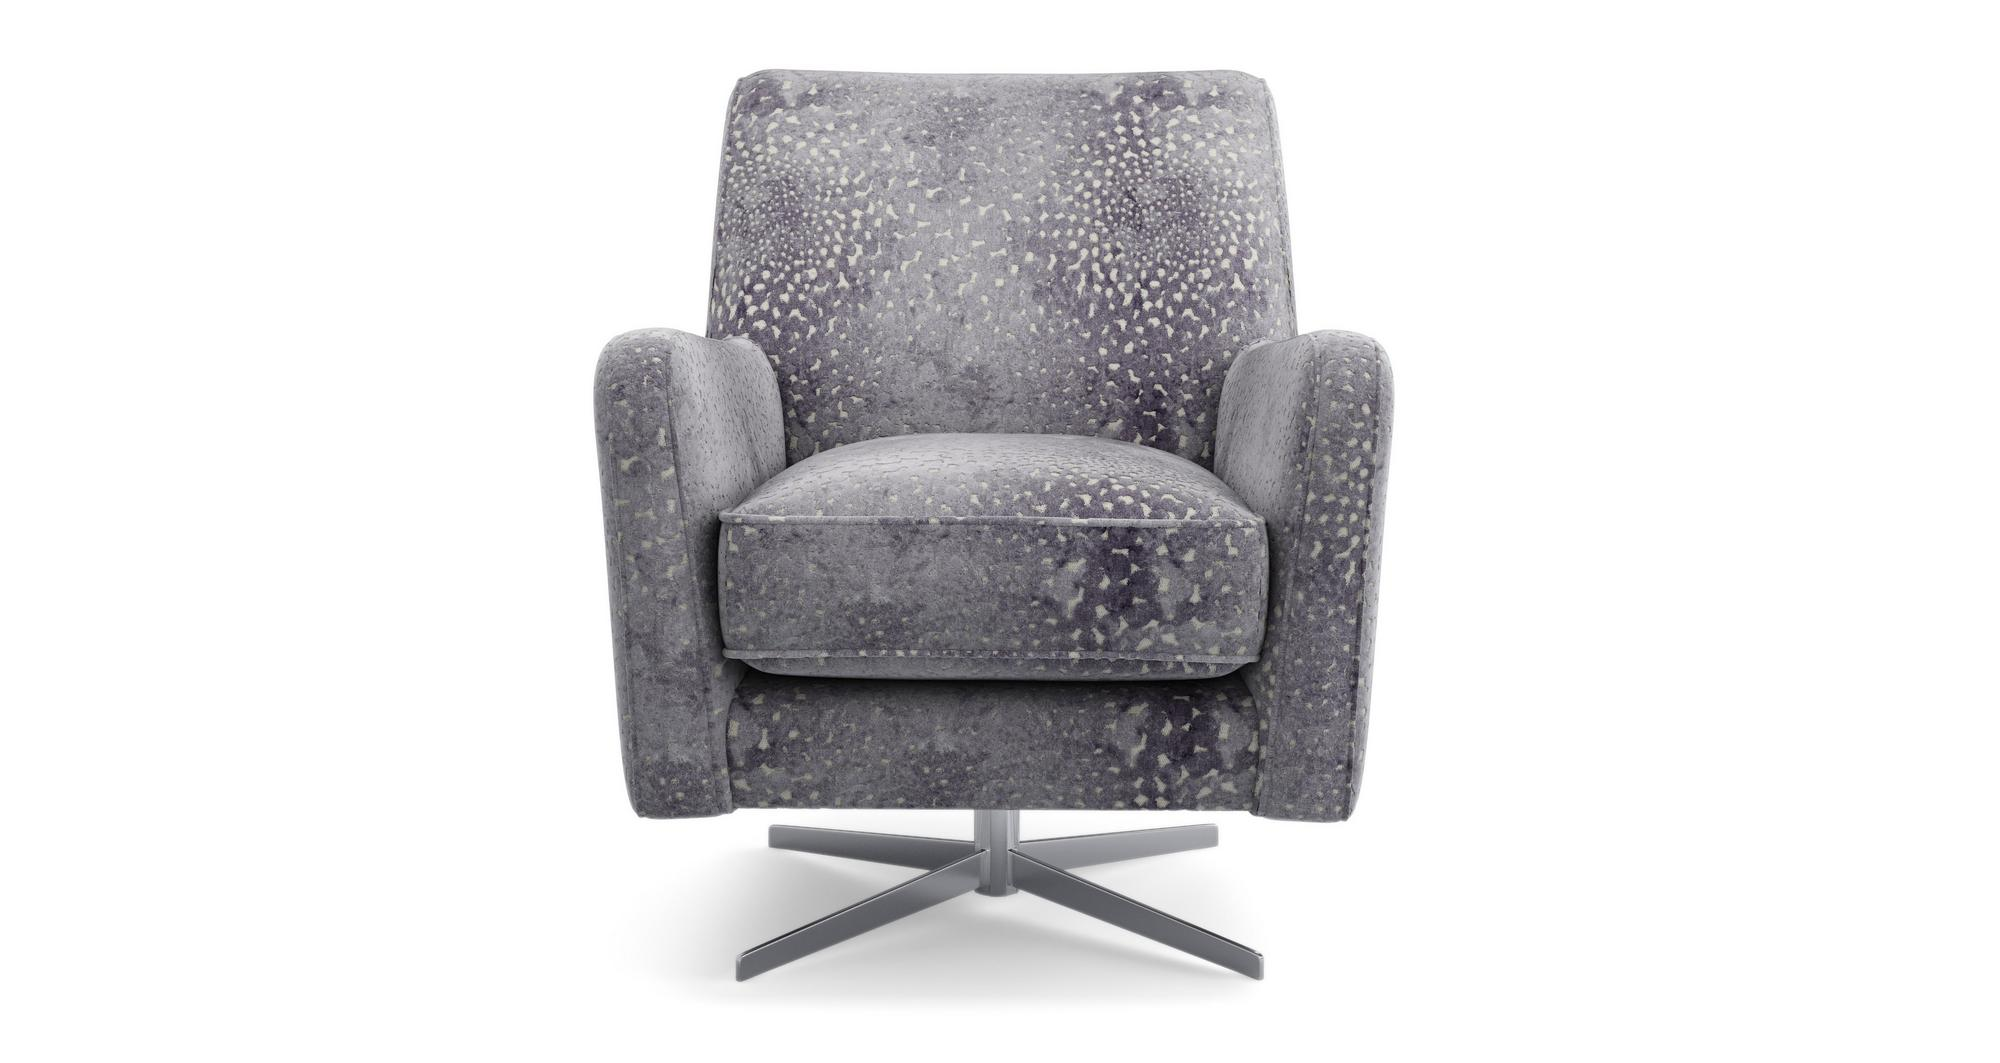 Dfs Sophia Grey Combination Fabric Accent Swivel Chair Ebay